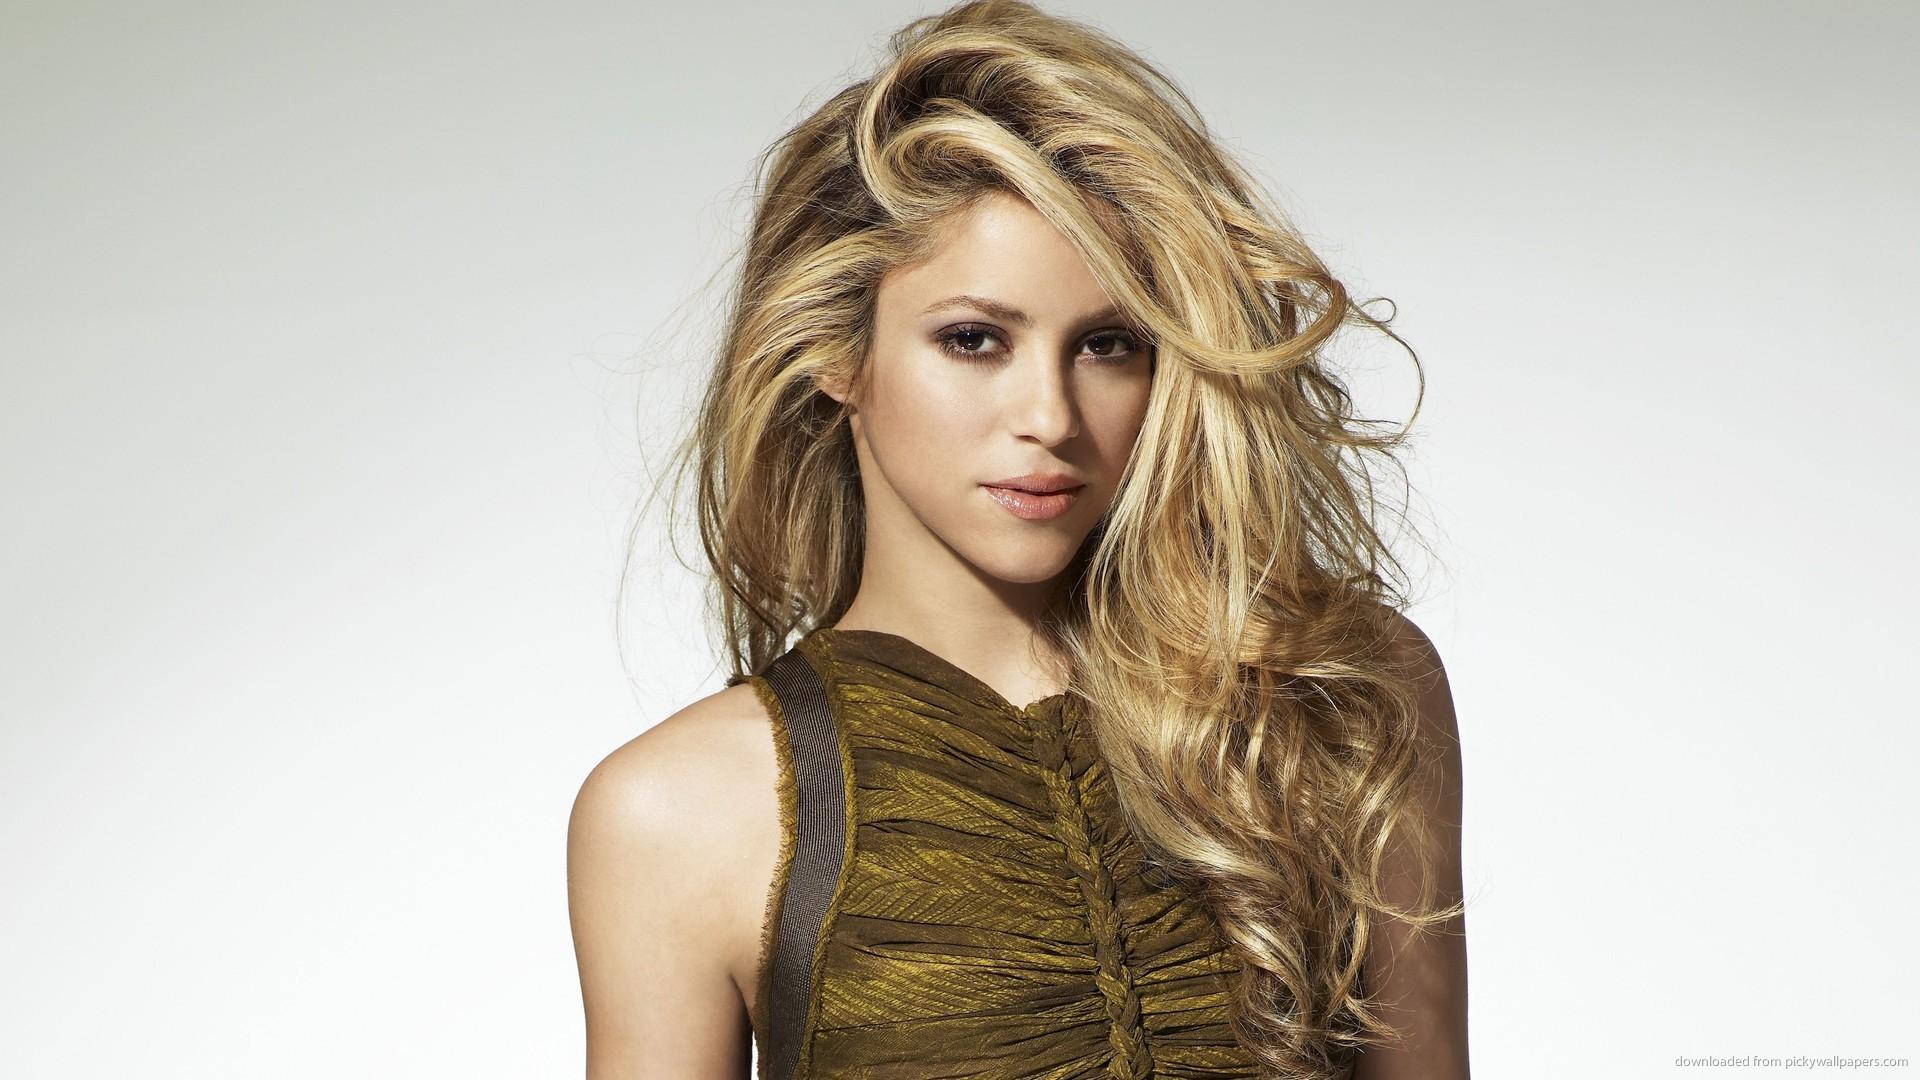 Shakira Wallpapers Hd 1920×1080 Shakira Pics Wallpapers (54 Wallpapers) |  Adorable Wallpapers · World Most Beautiful WomanHigh …